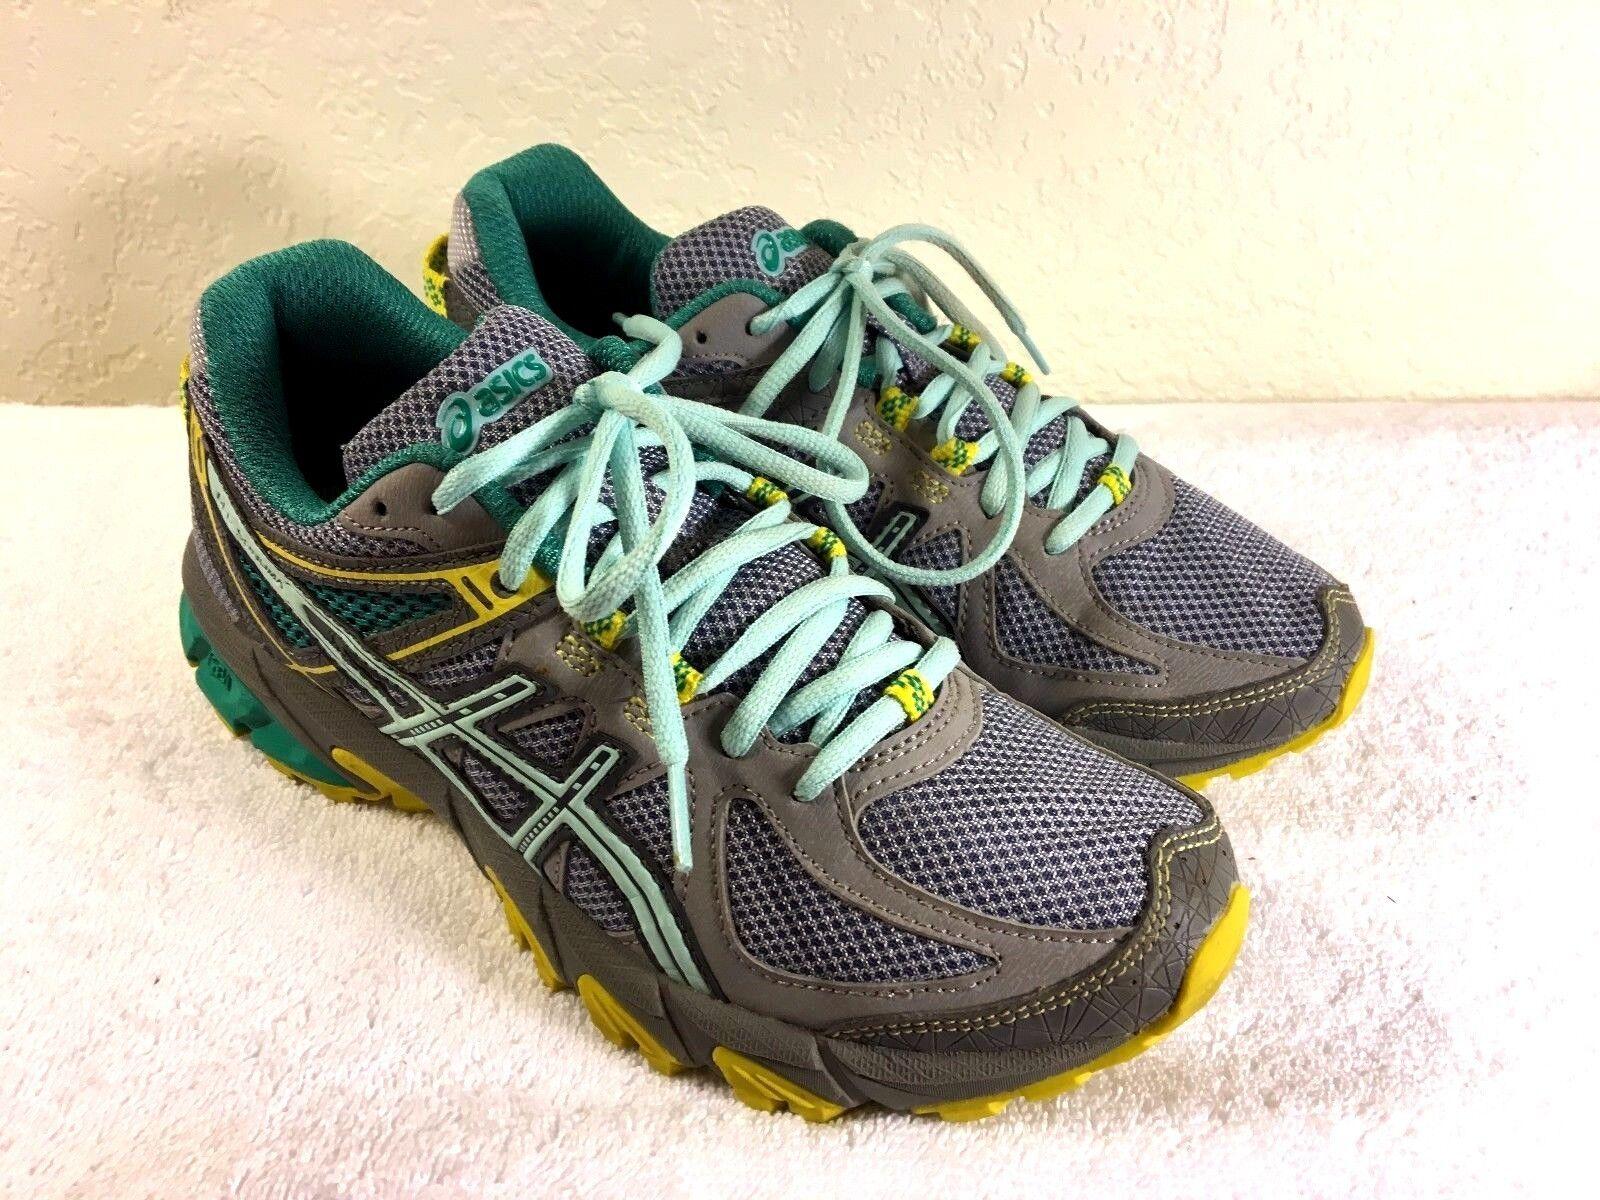 ASICS T4F79 women's Gel-Sonoma Green & Grey Running shoes Size US 7.5 NIce